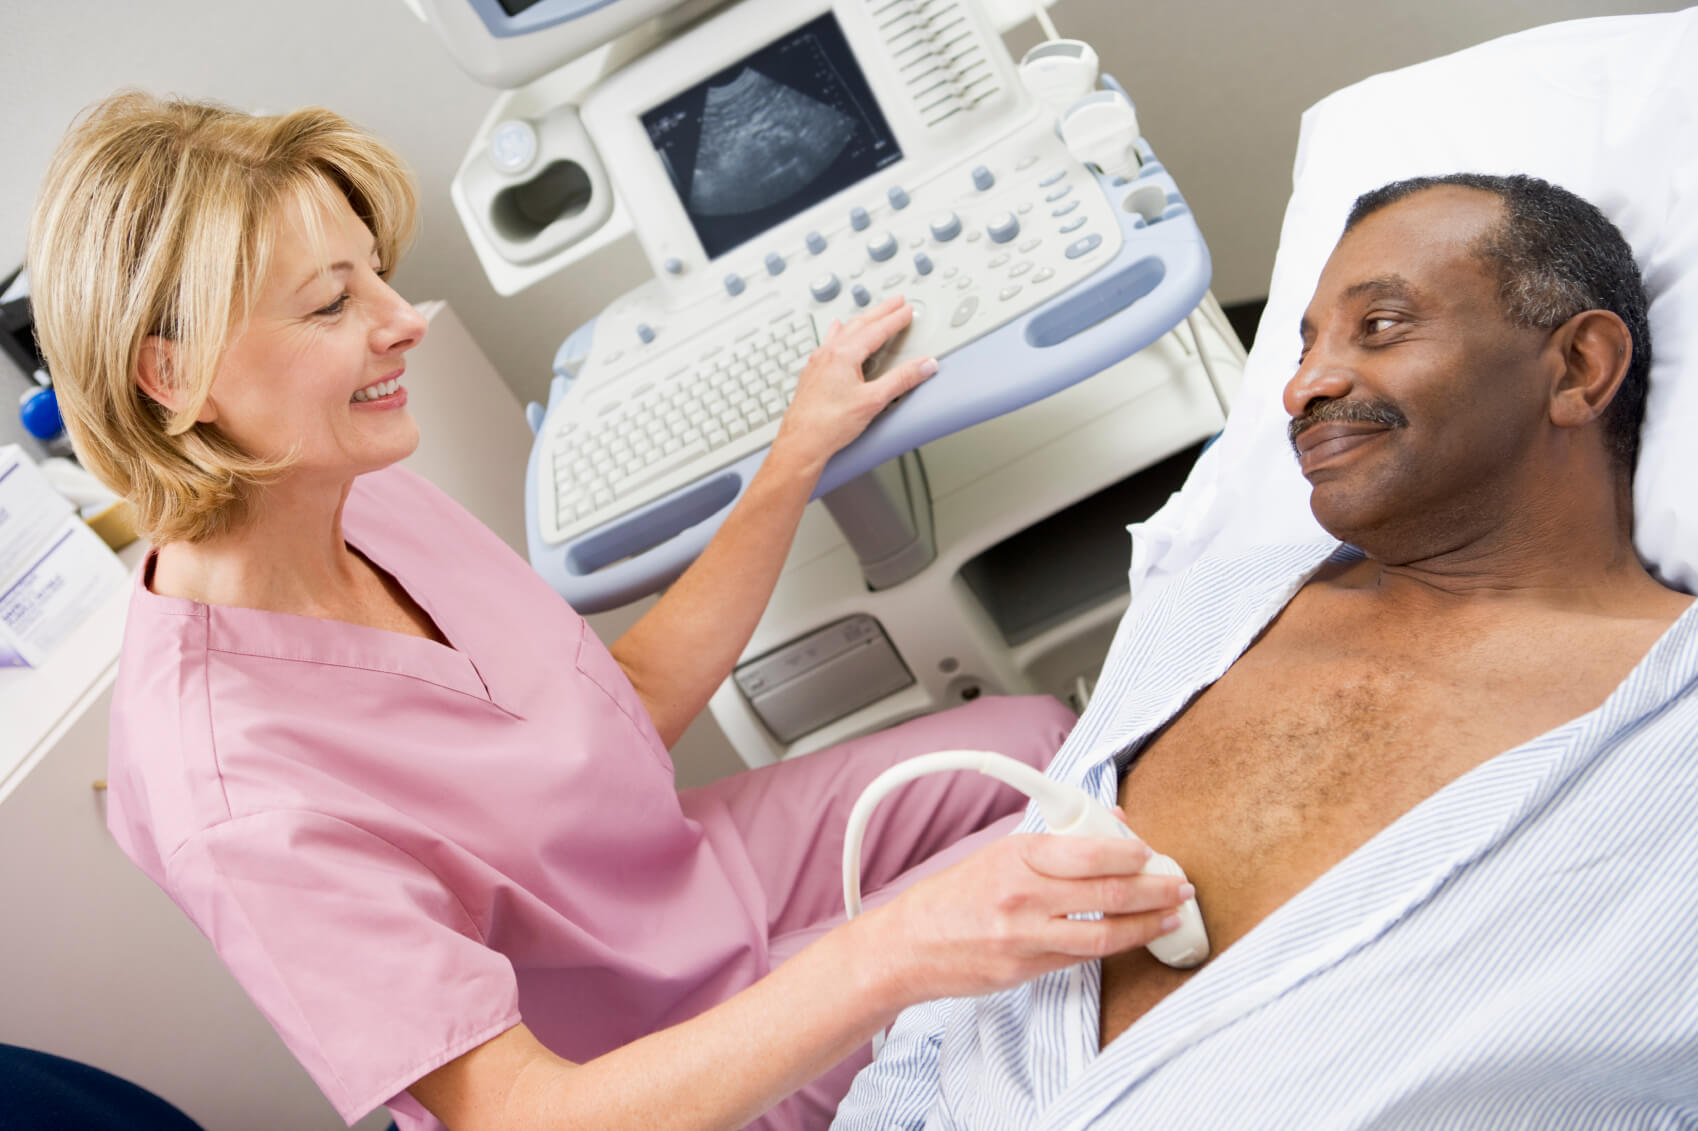 Radiology Exam Ultrasound Scan